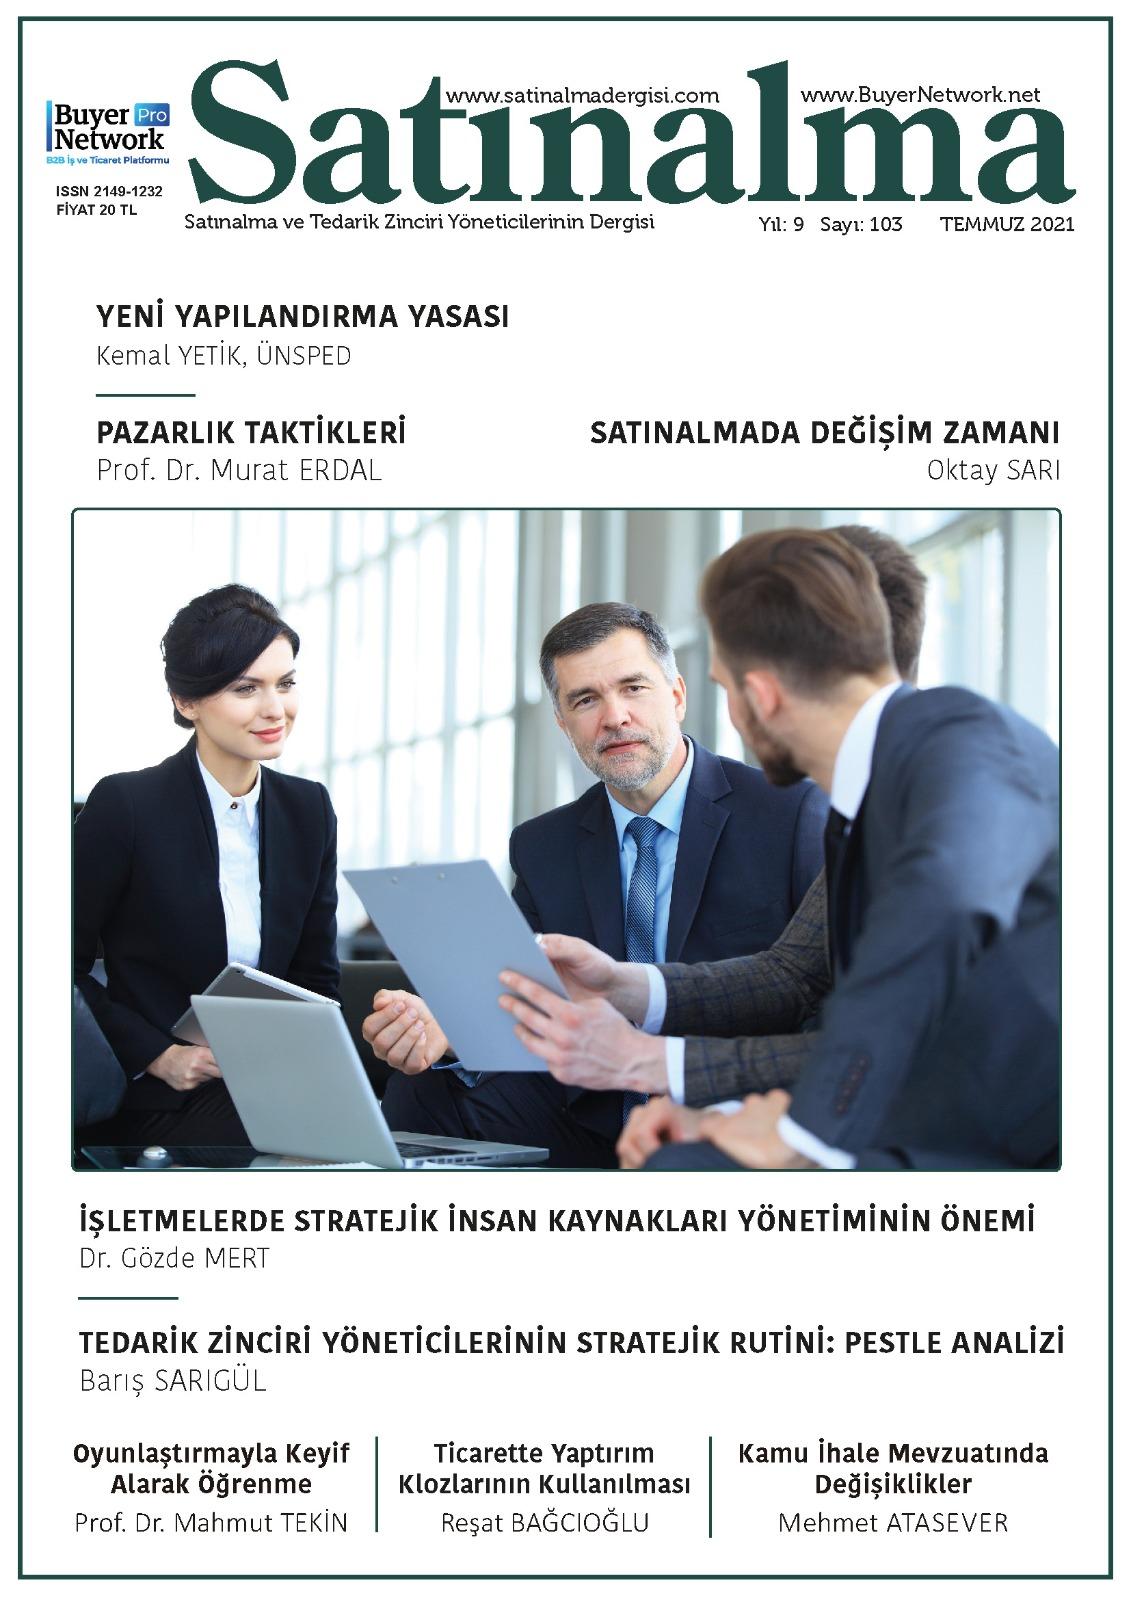 Satinalma_Dergisi_Sayi_103.jpeg